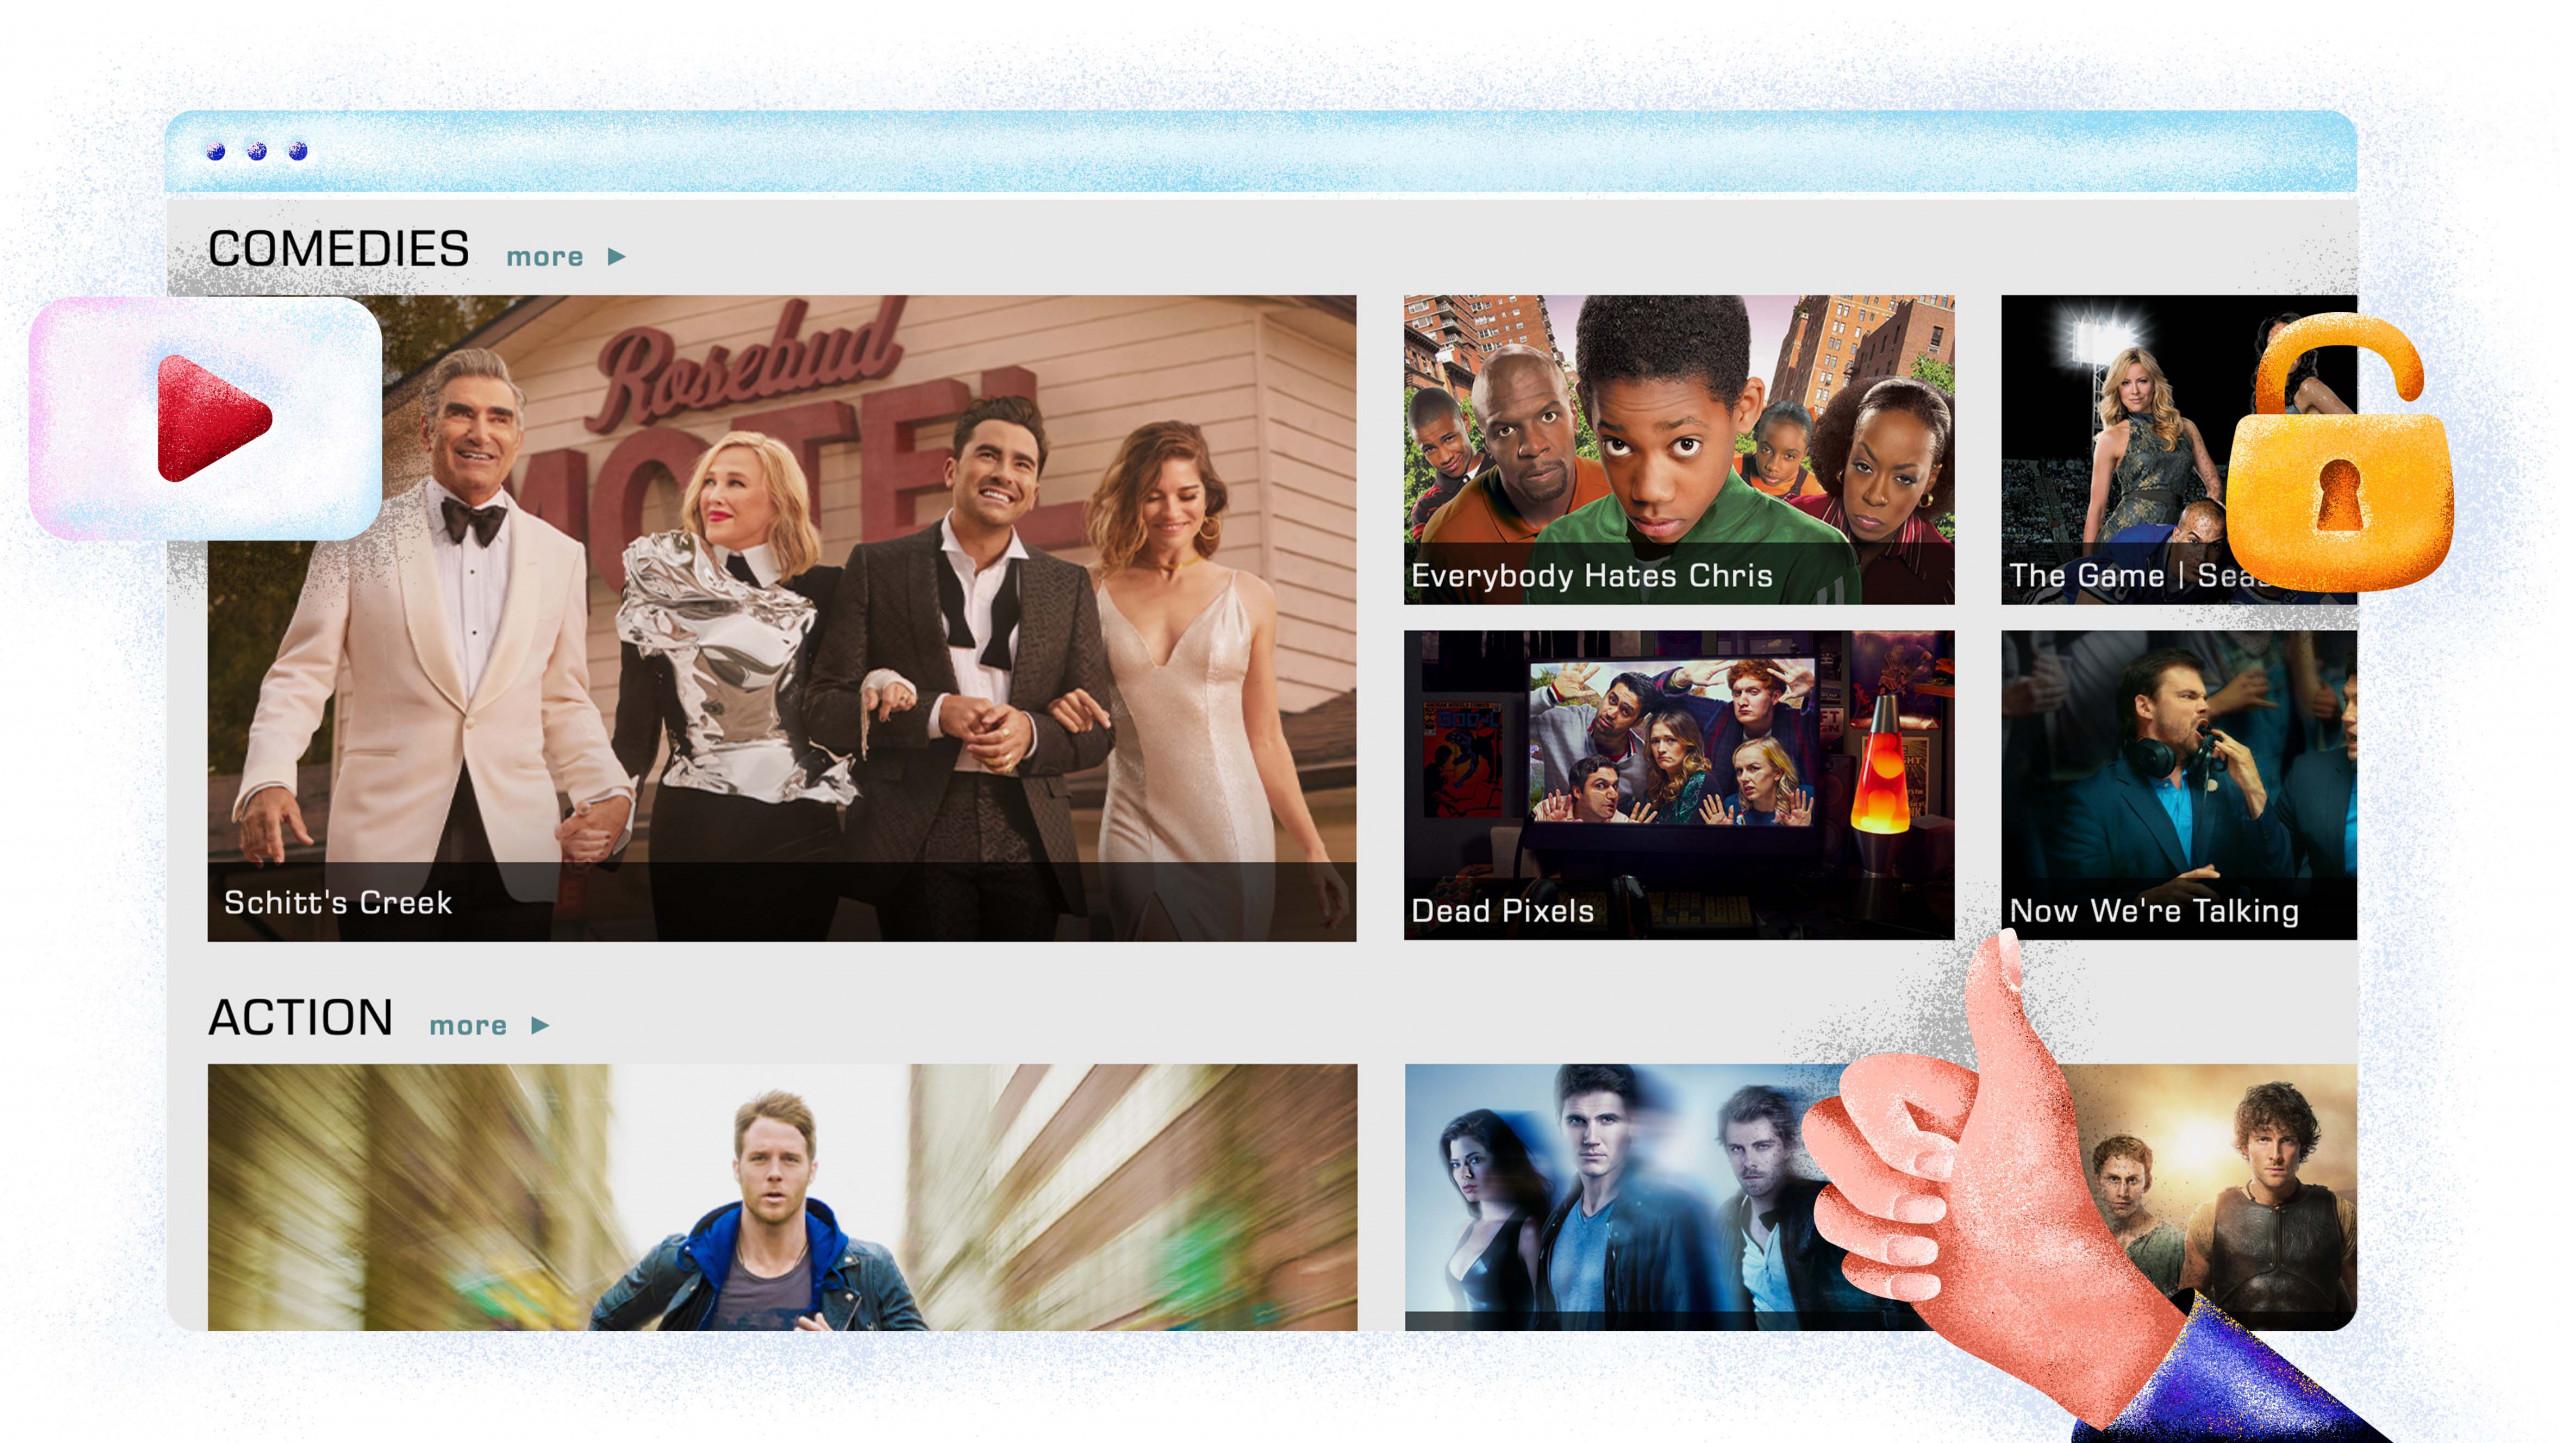 CW Seed streaming modern és régi sorozatok